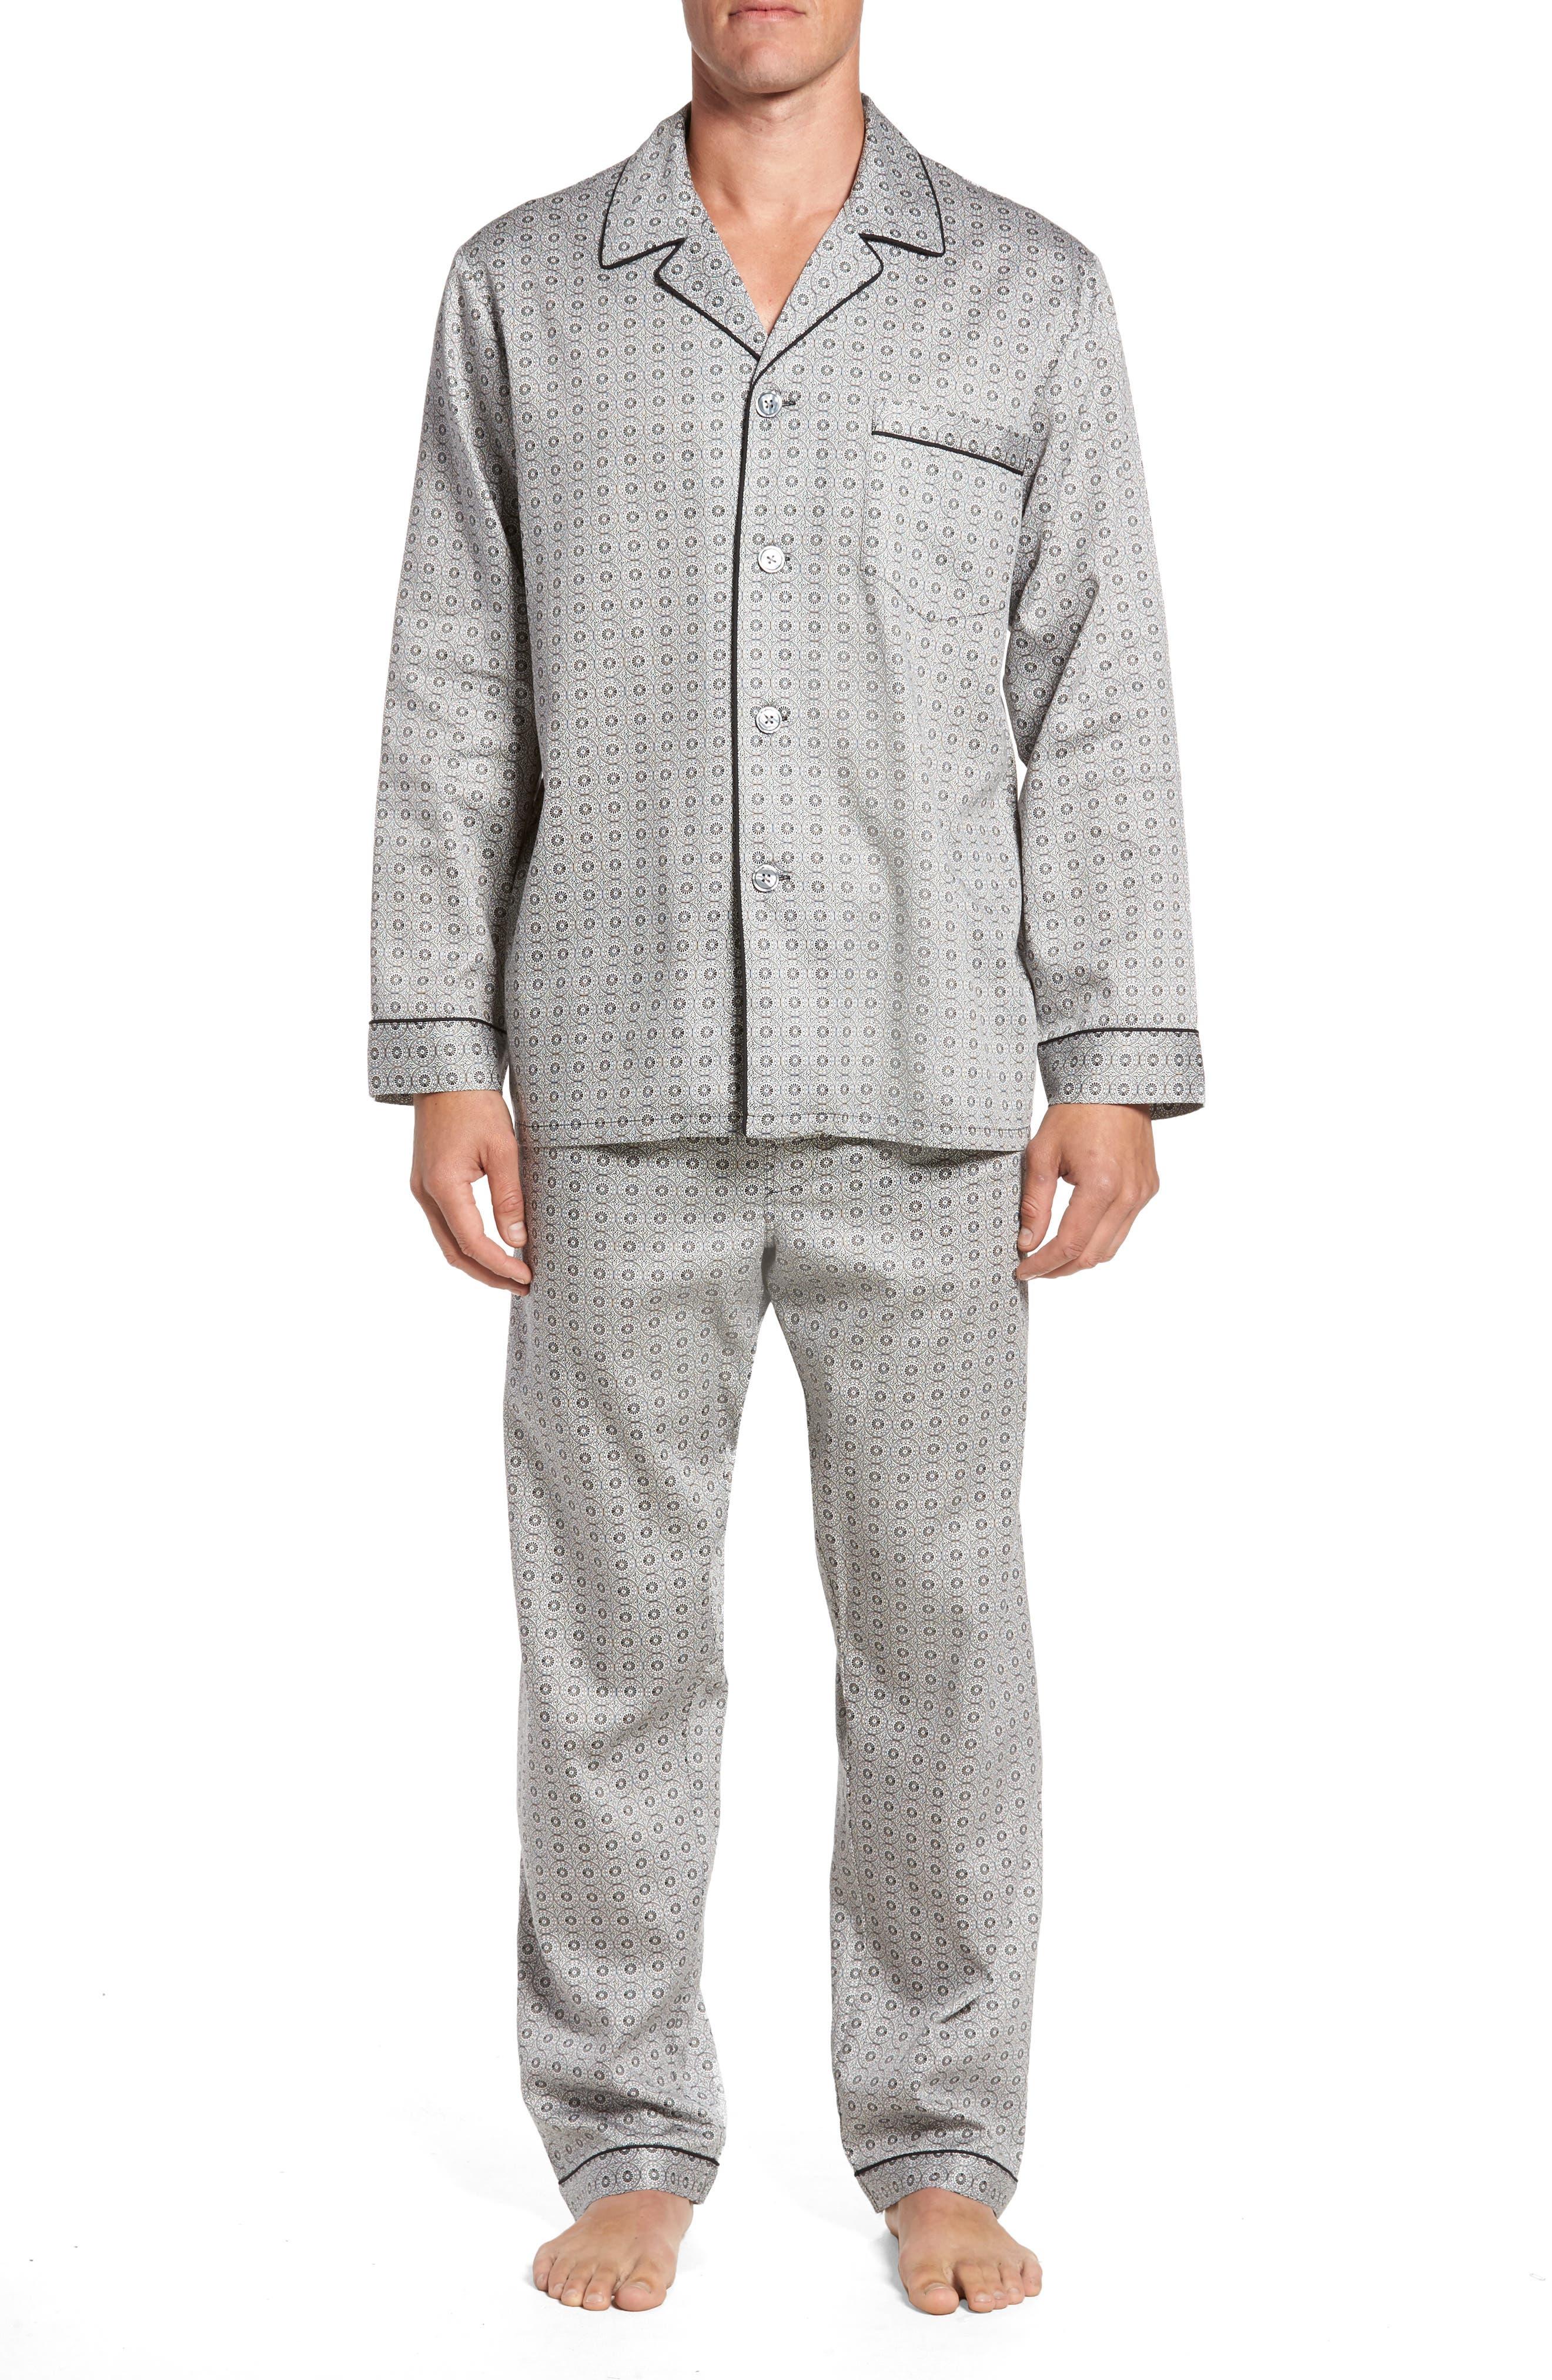 Winterlude Patterned Pajama Set,                         Main,                         color, Black